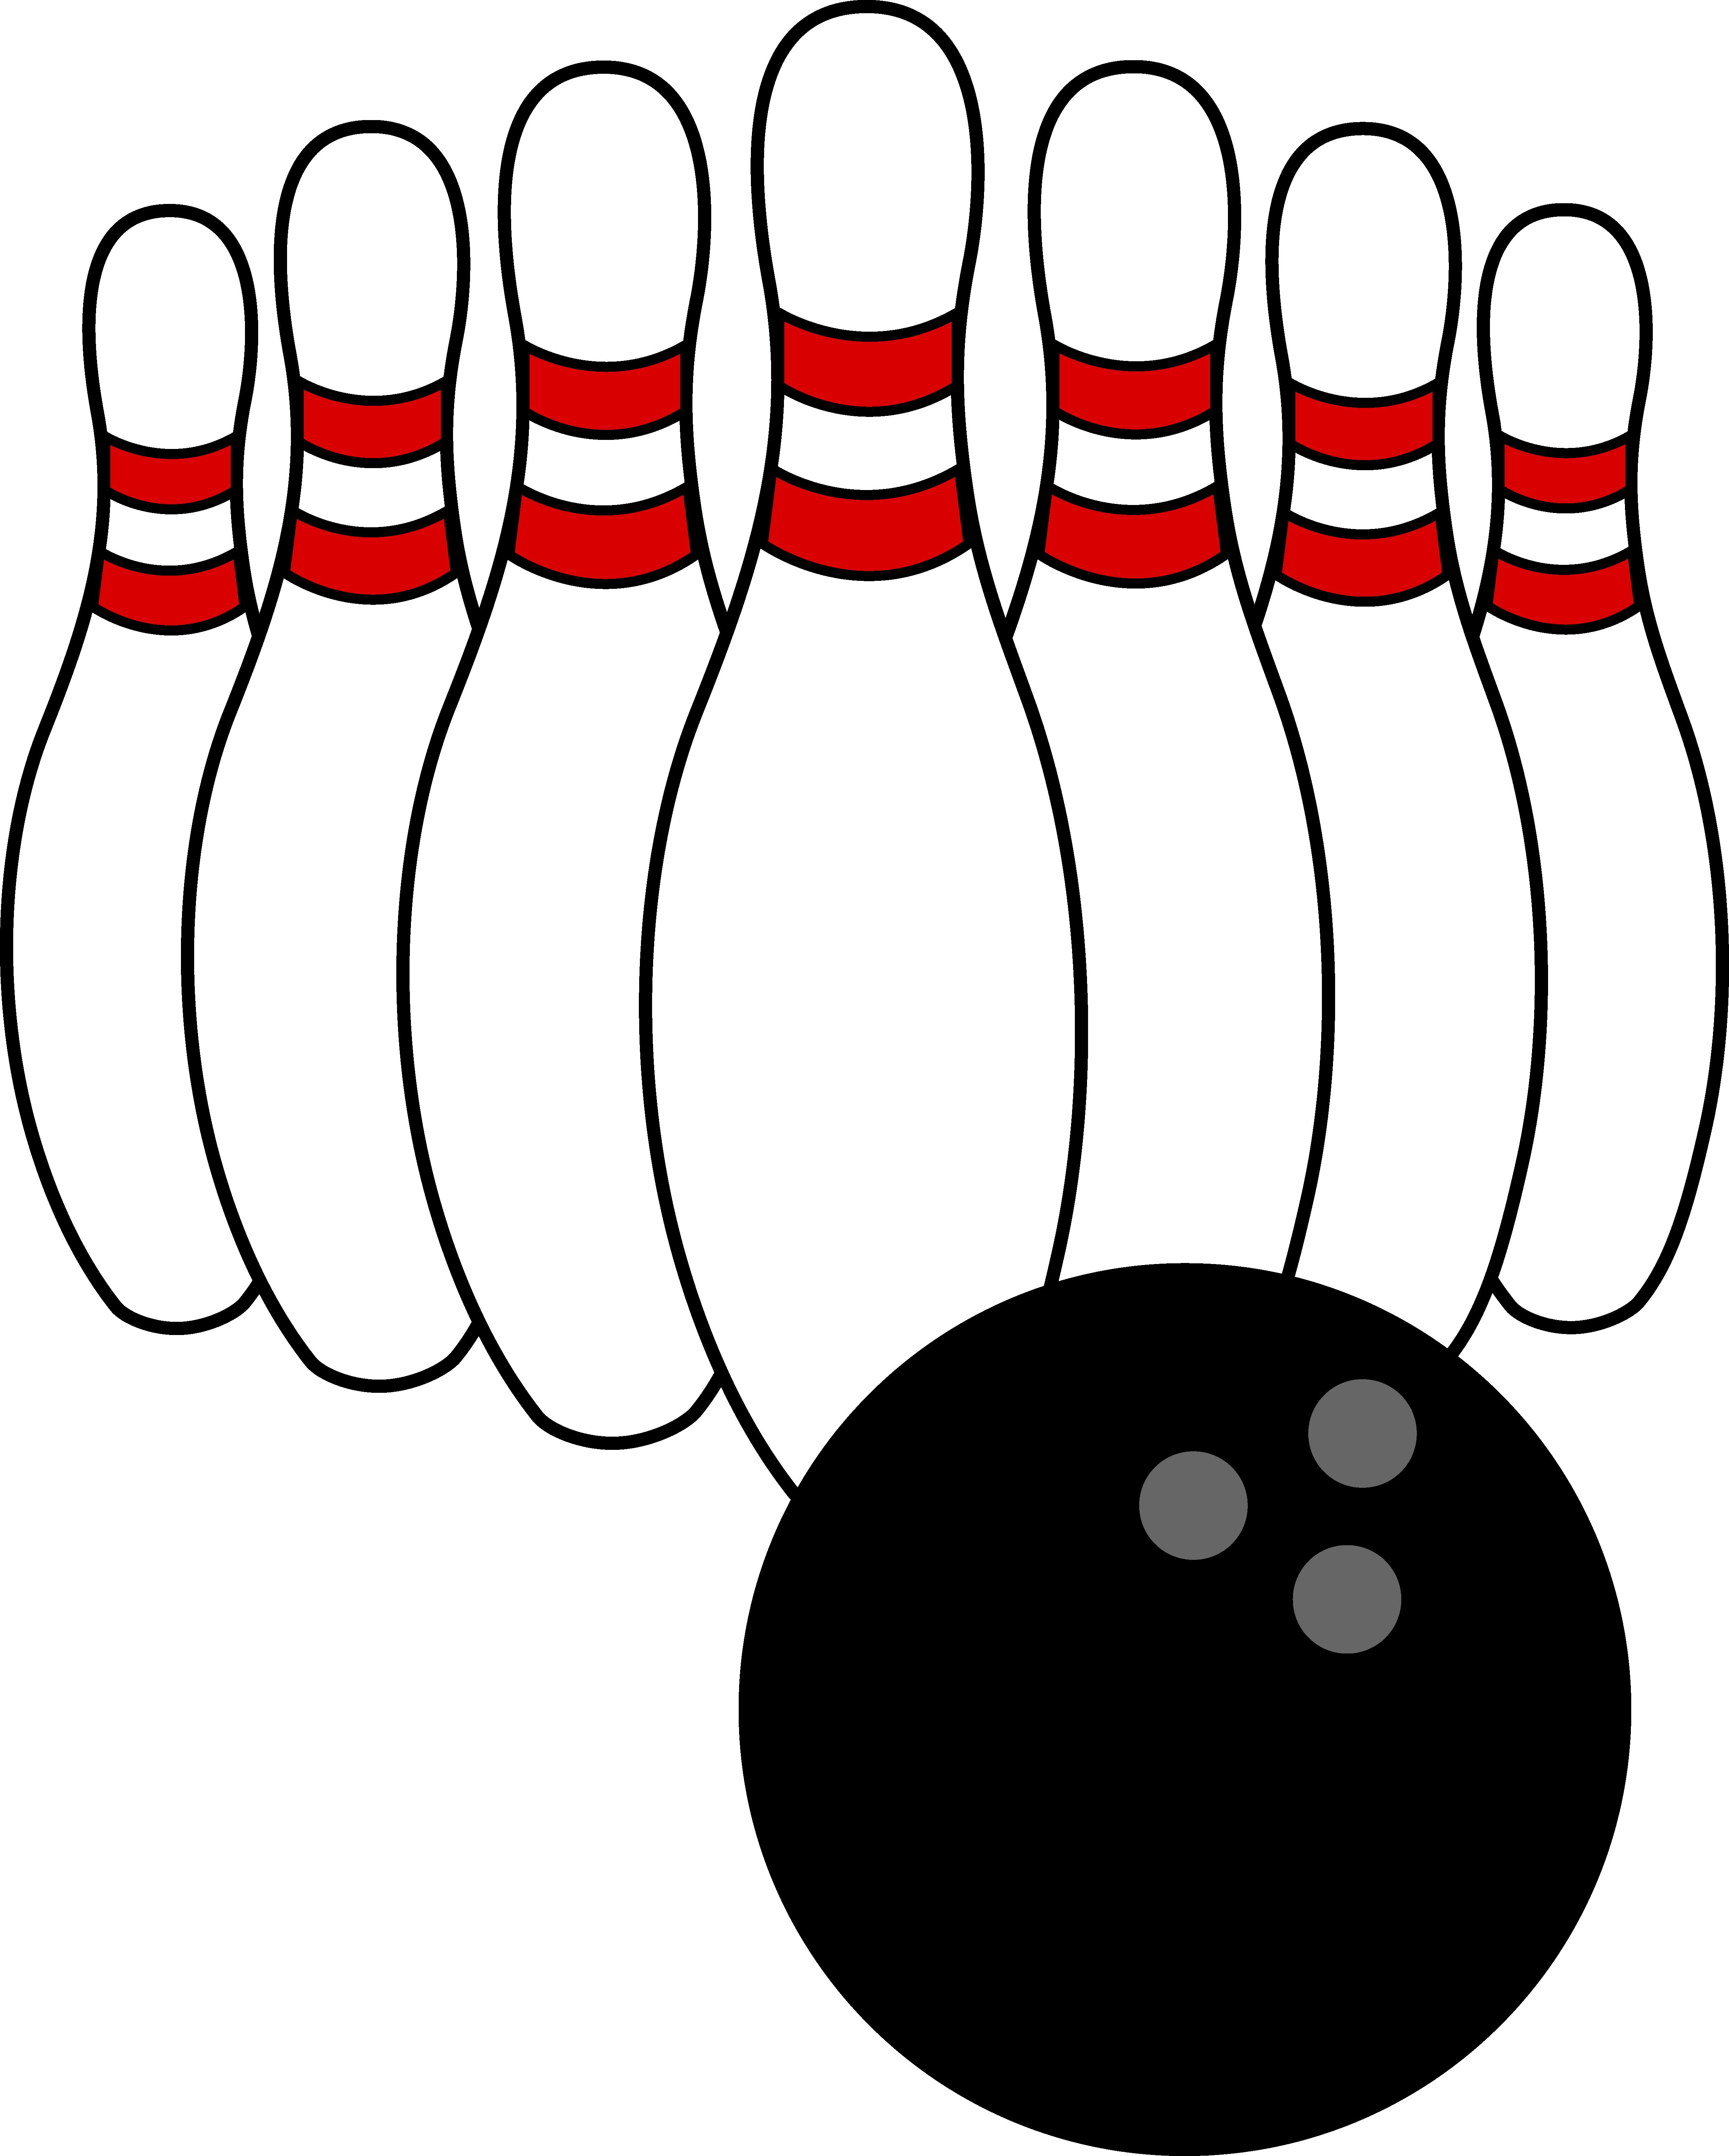 Bowling clipart images 1 » C